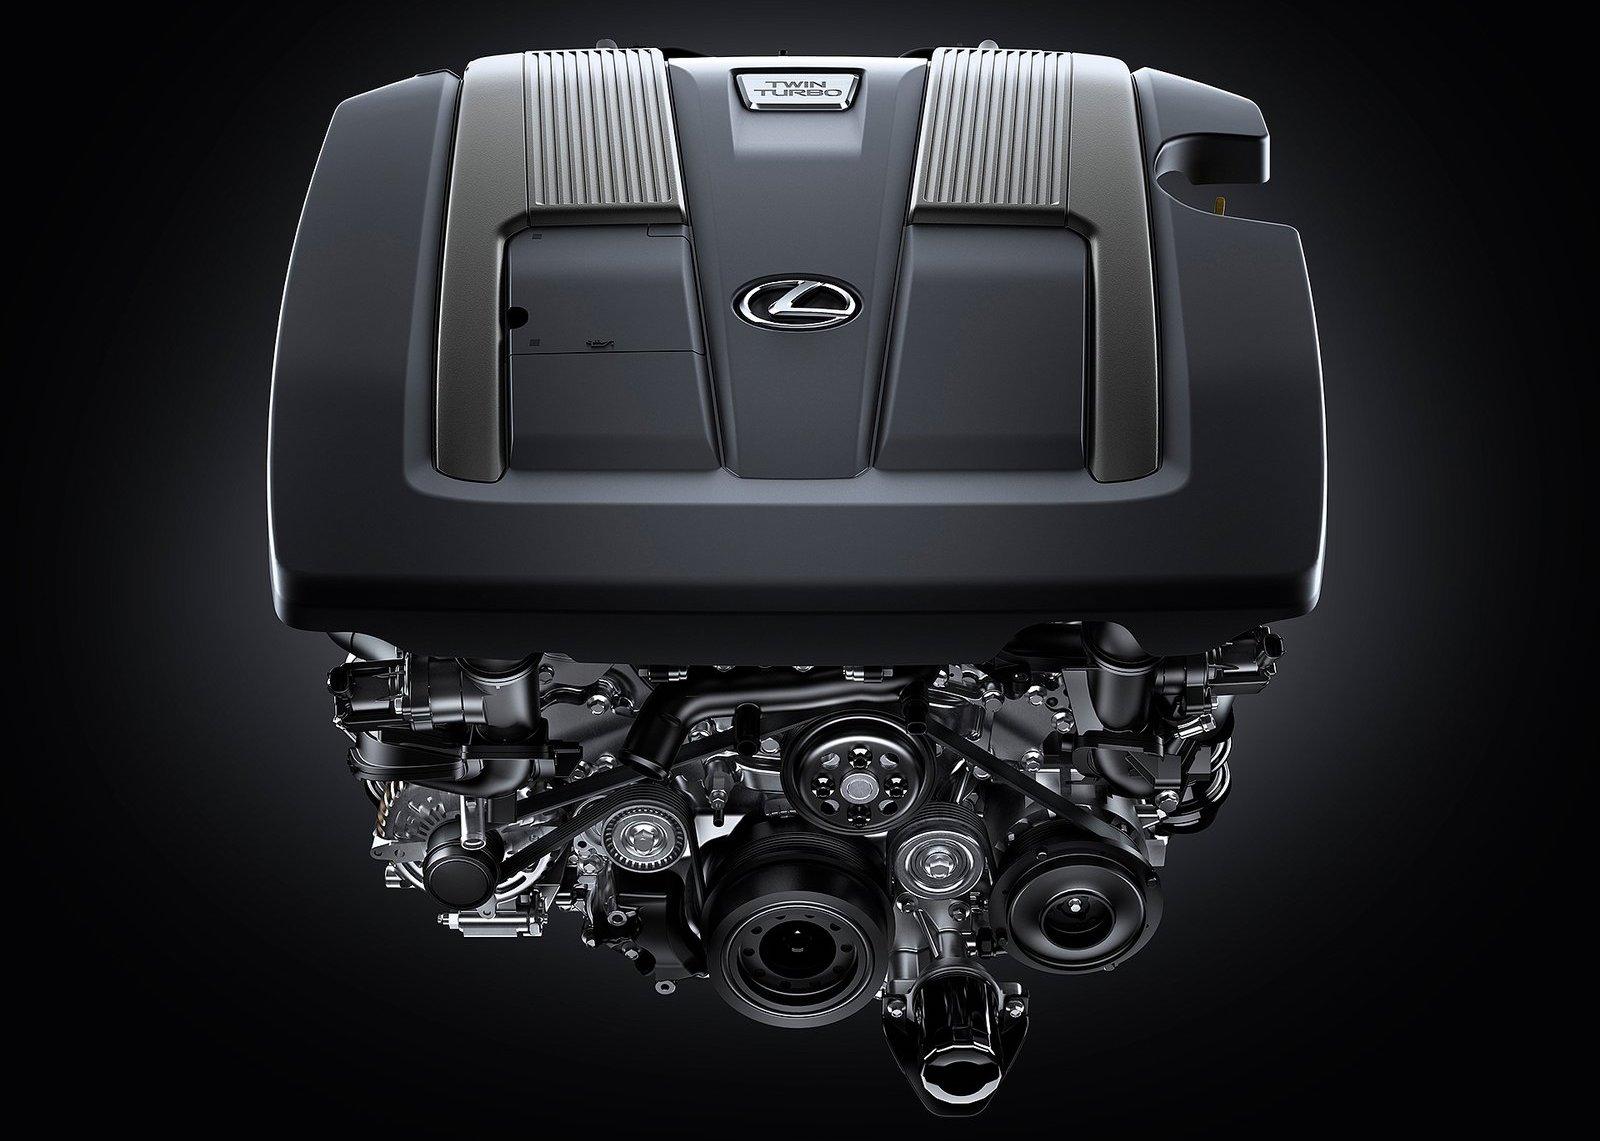 2020 Toyota LandCruiser 300 Series to get 3 5 twin-turbo V6